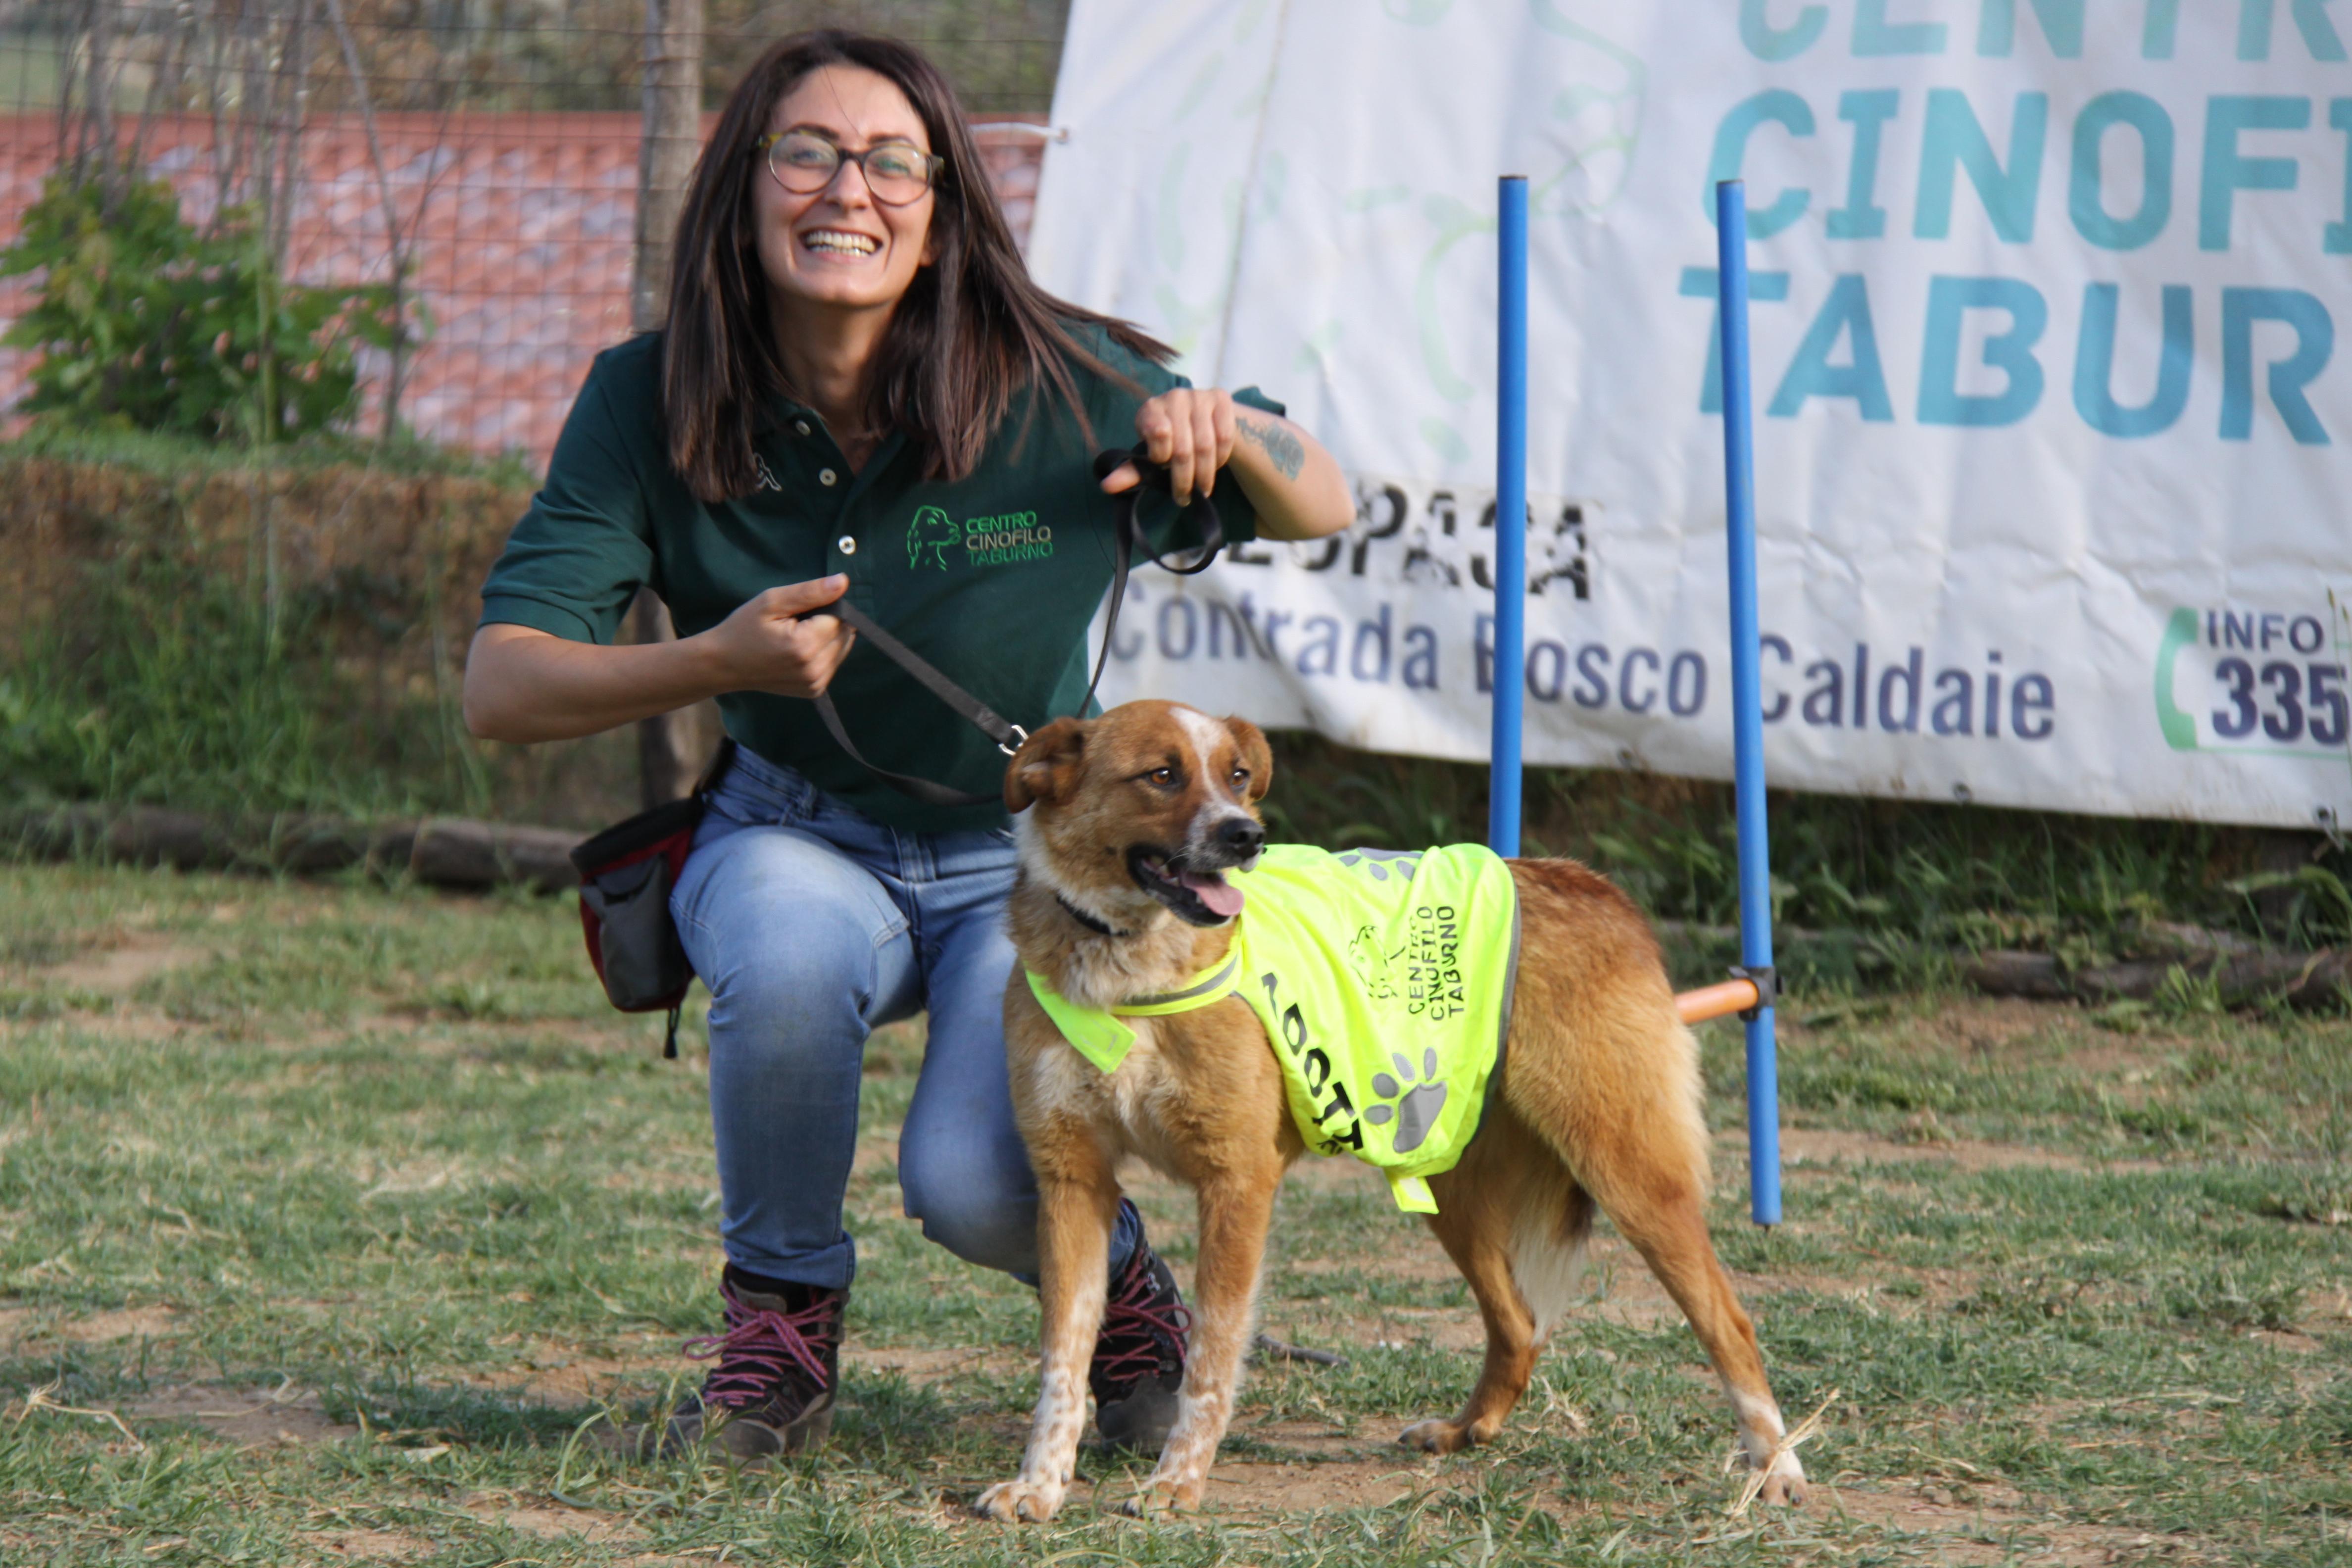 """I Workshop ""La rieducazione dei cani di canile"" Dott. Carlo Ciceroni"